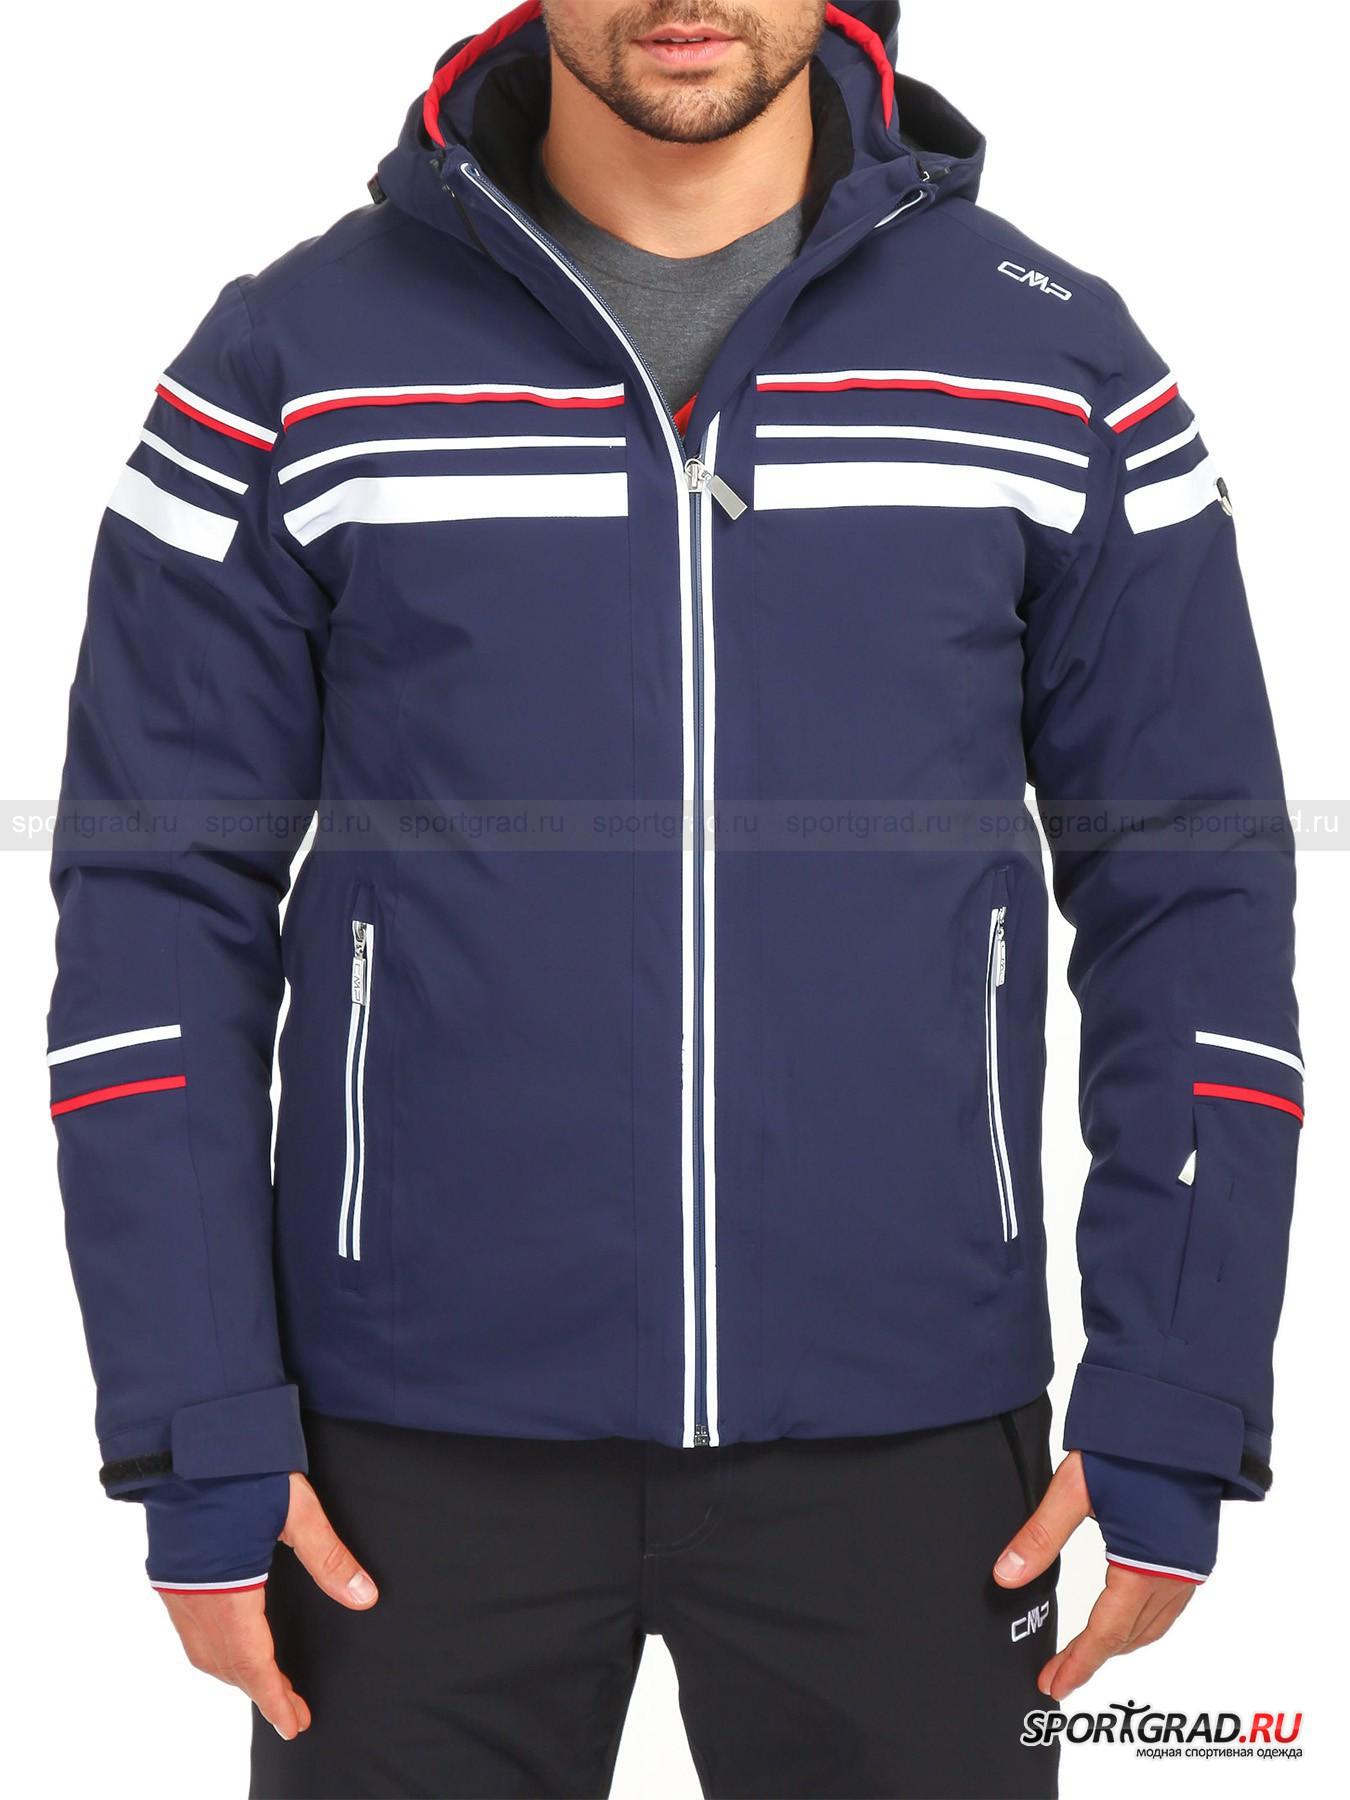 Куртка мужская горнолыжная MAN SKI JACKET  CAMPAGNOLO от Спортград